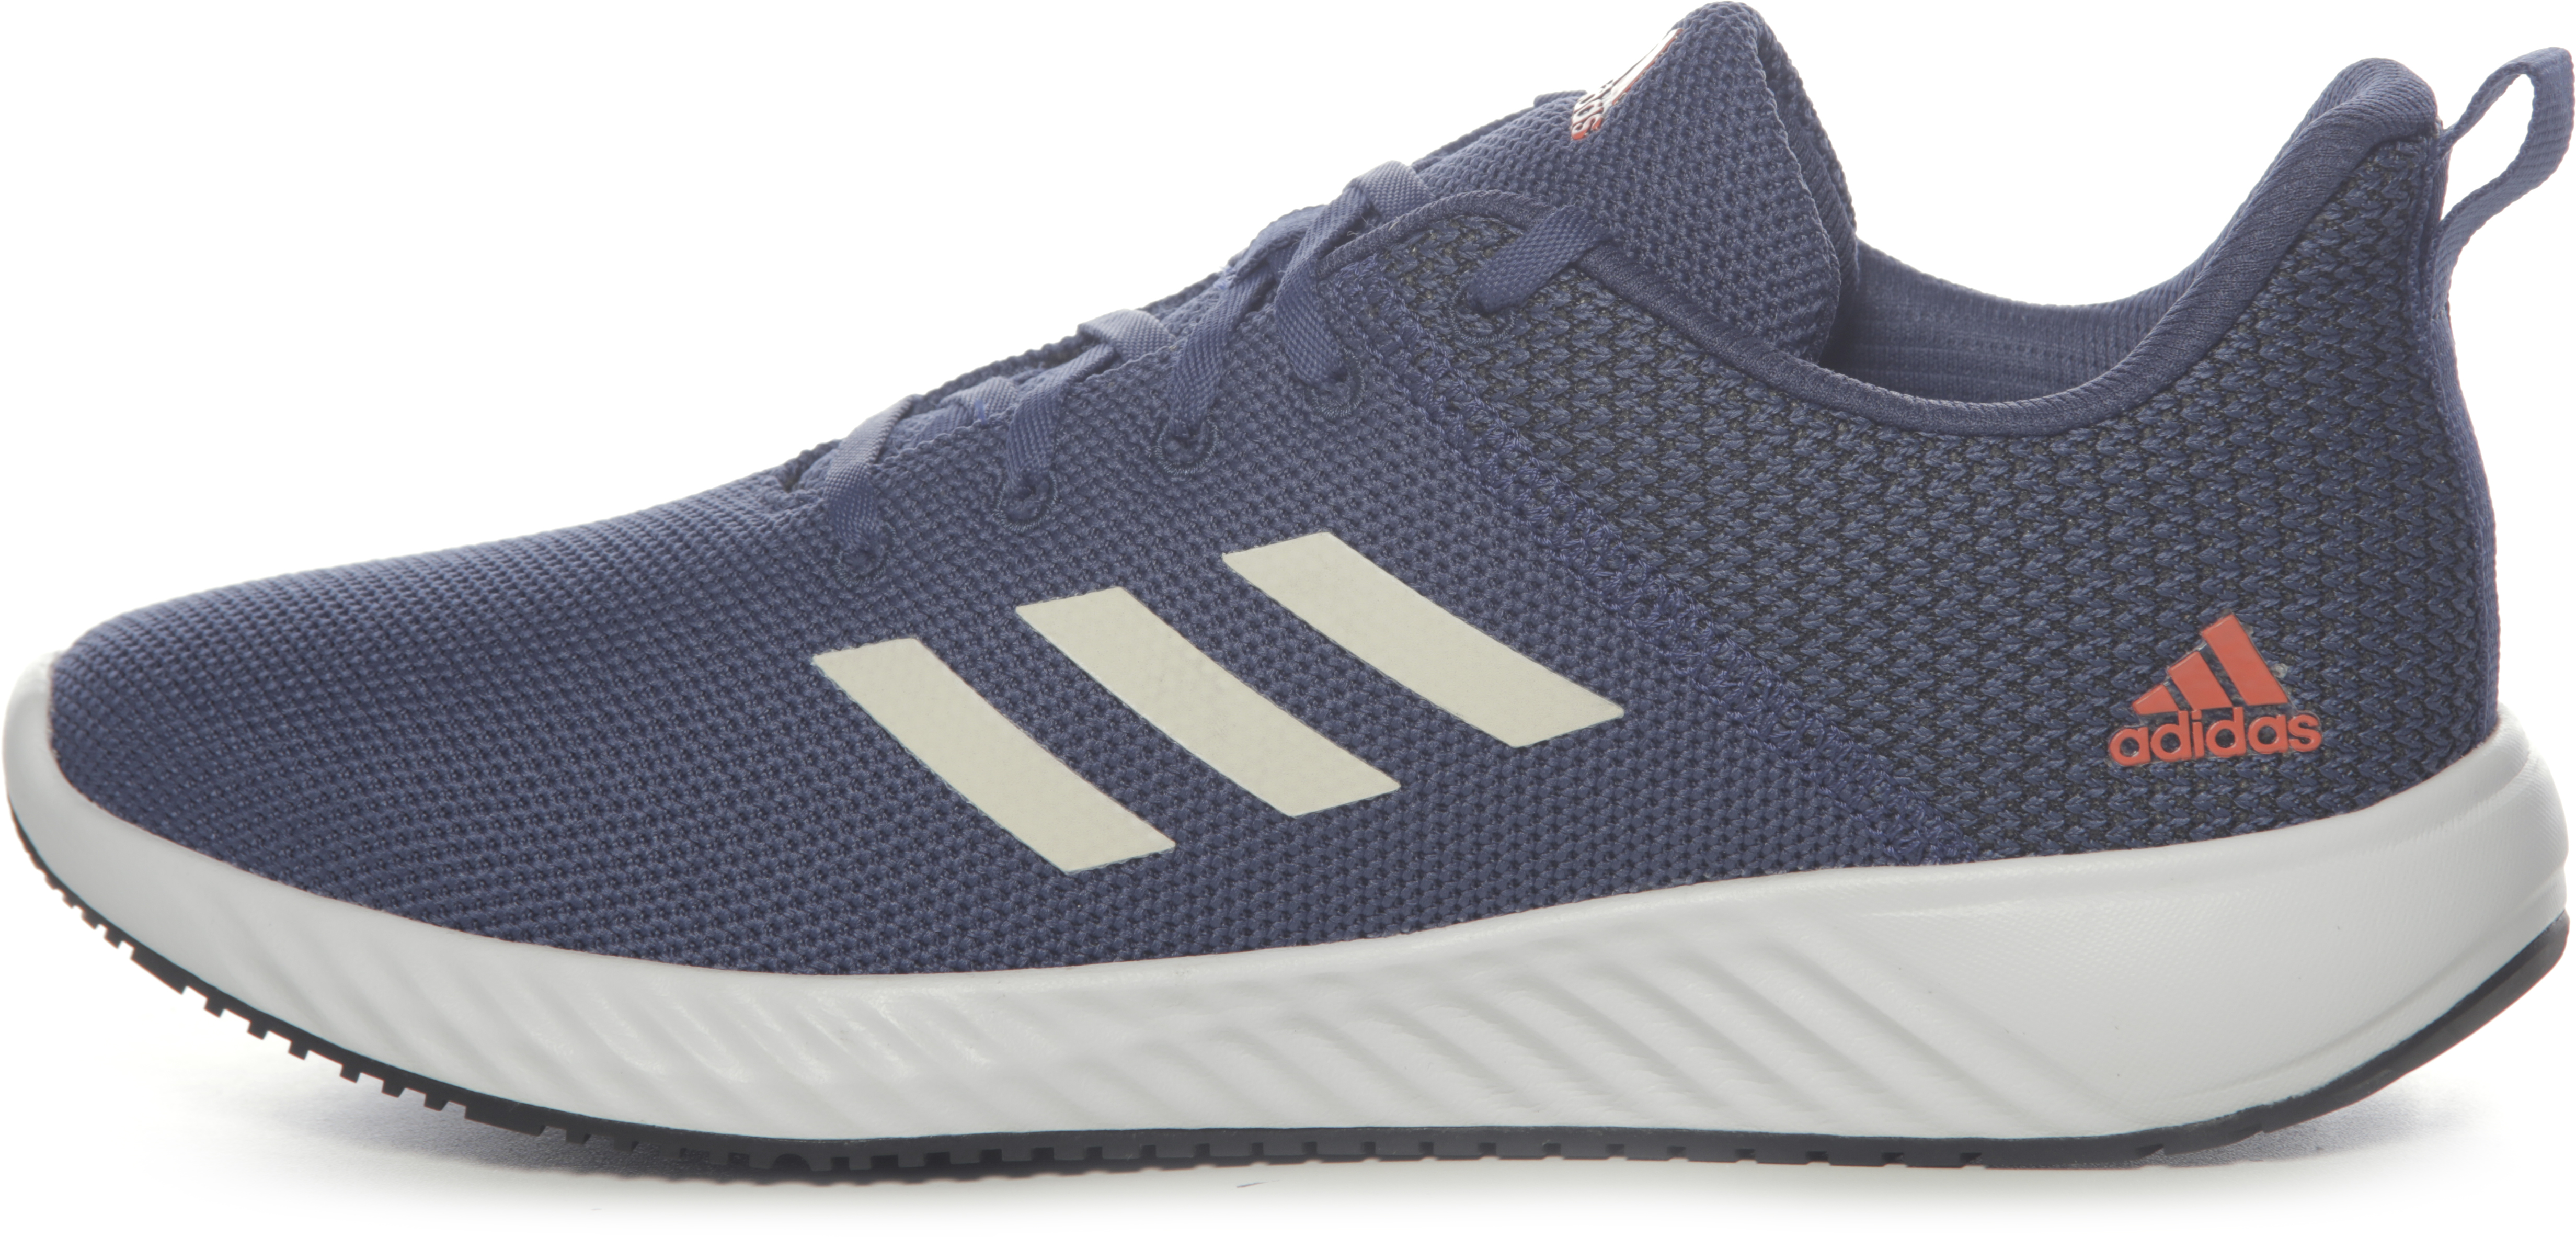 adidas | ADIDAS STRIX M RUNNING SHOES